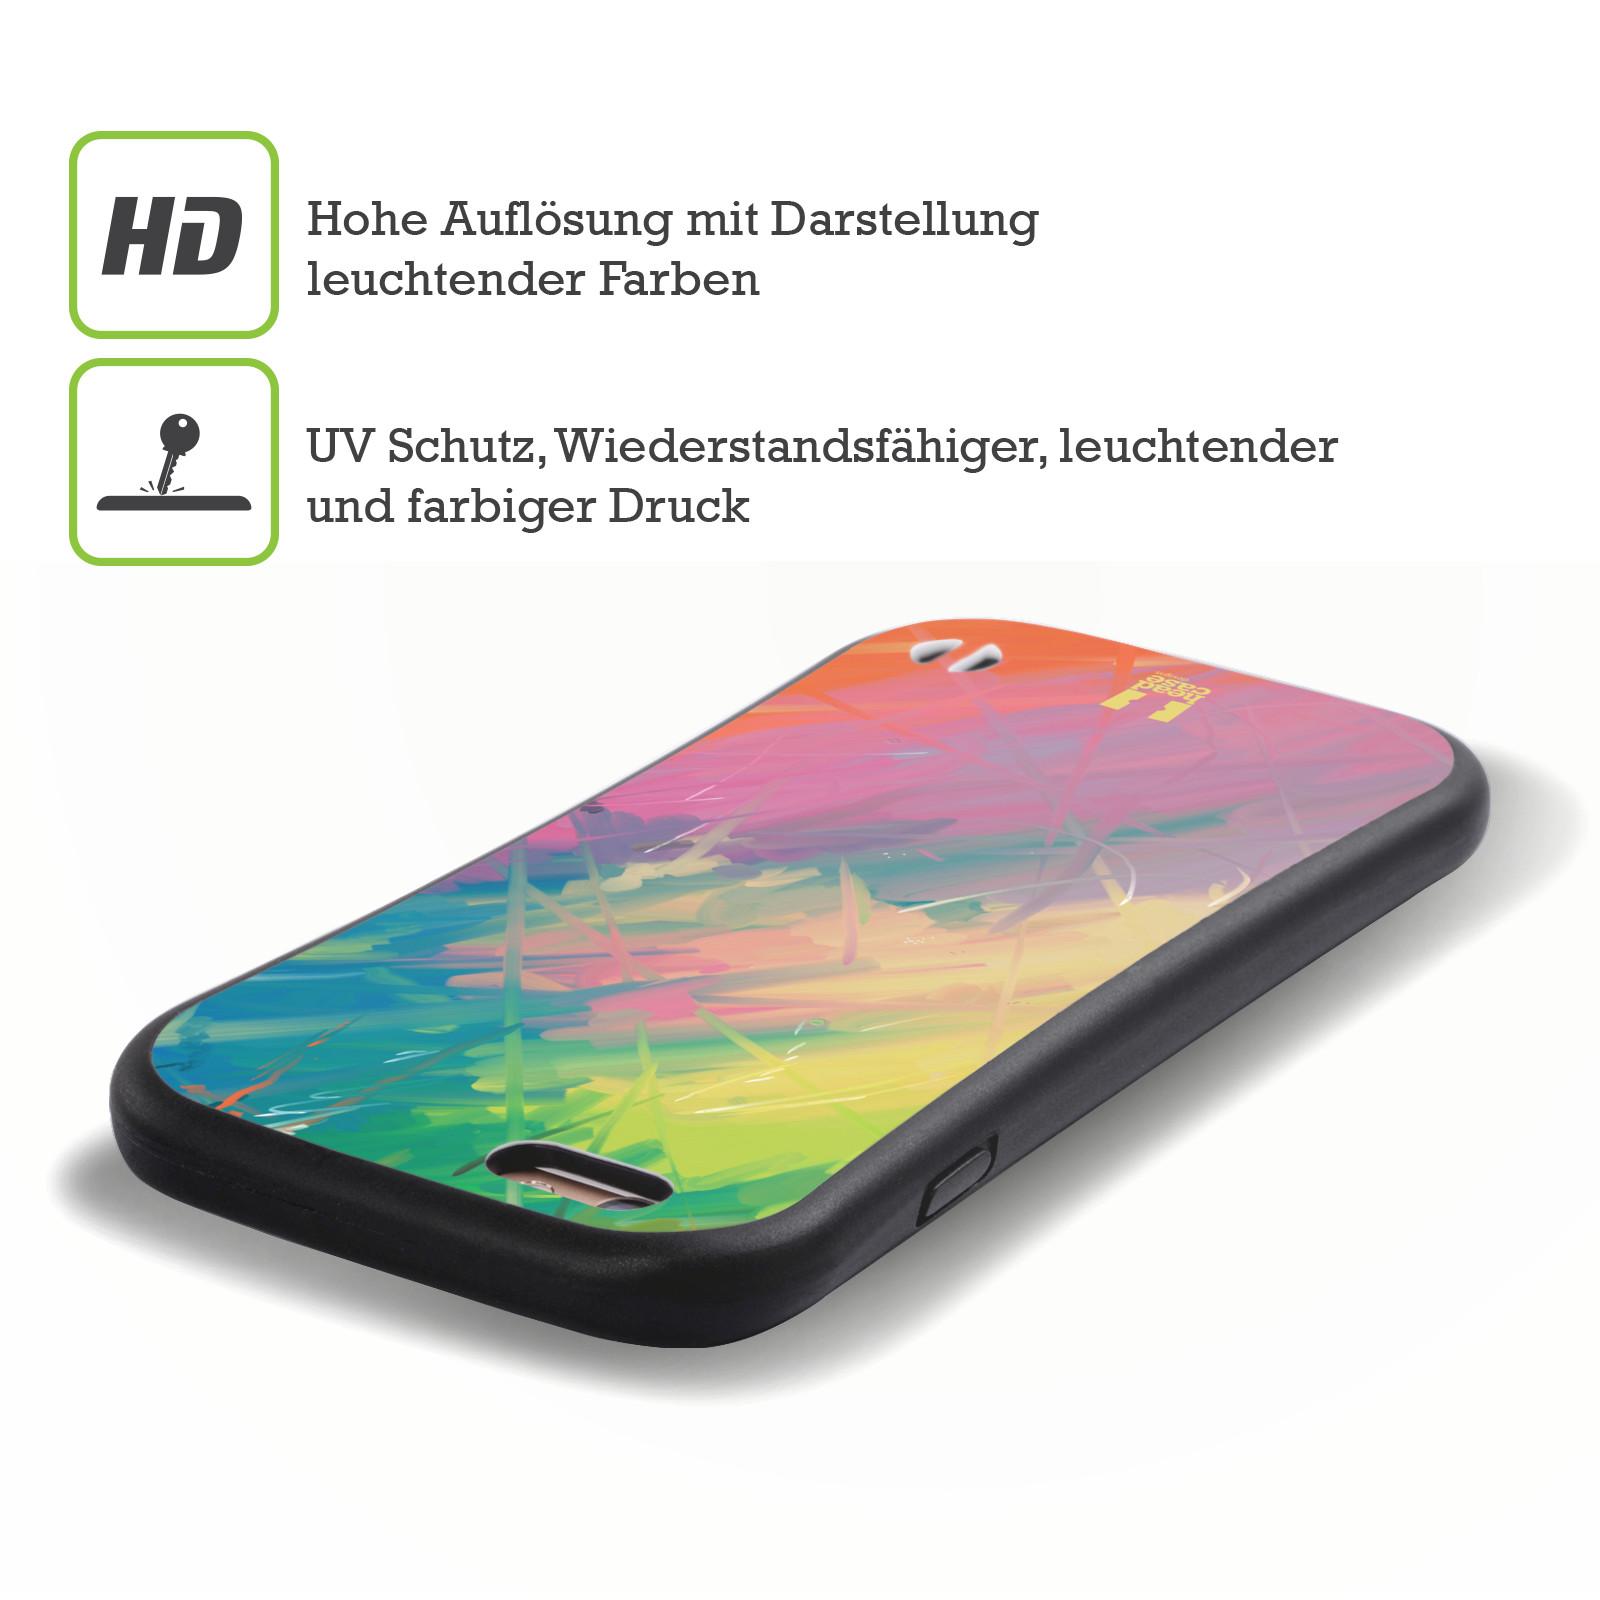 HEAD-CASE-DESIGNS-RANDOM-BILDER-HYBRID-HULLE-FUR-APPLE-iPHONES-HANDYS